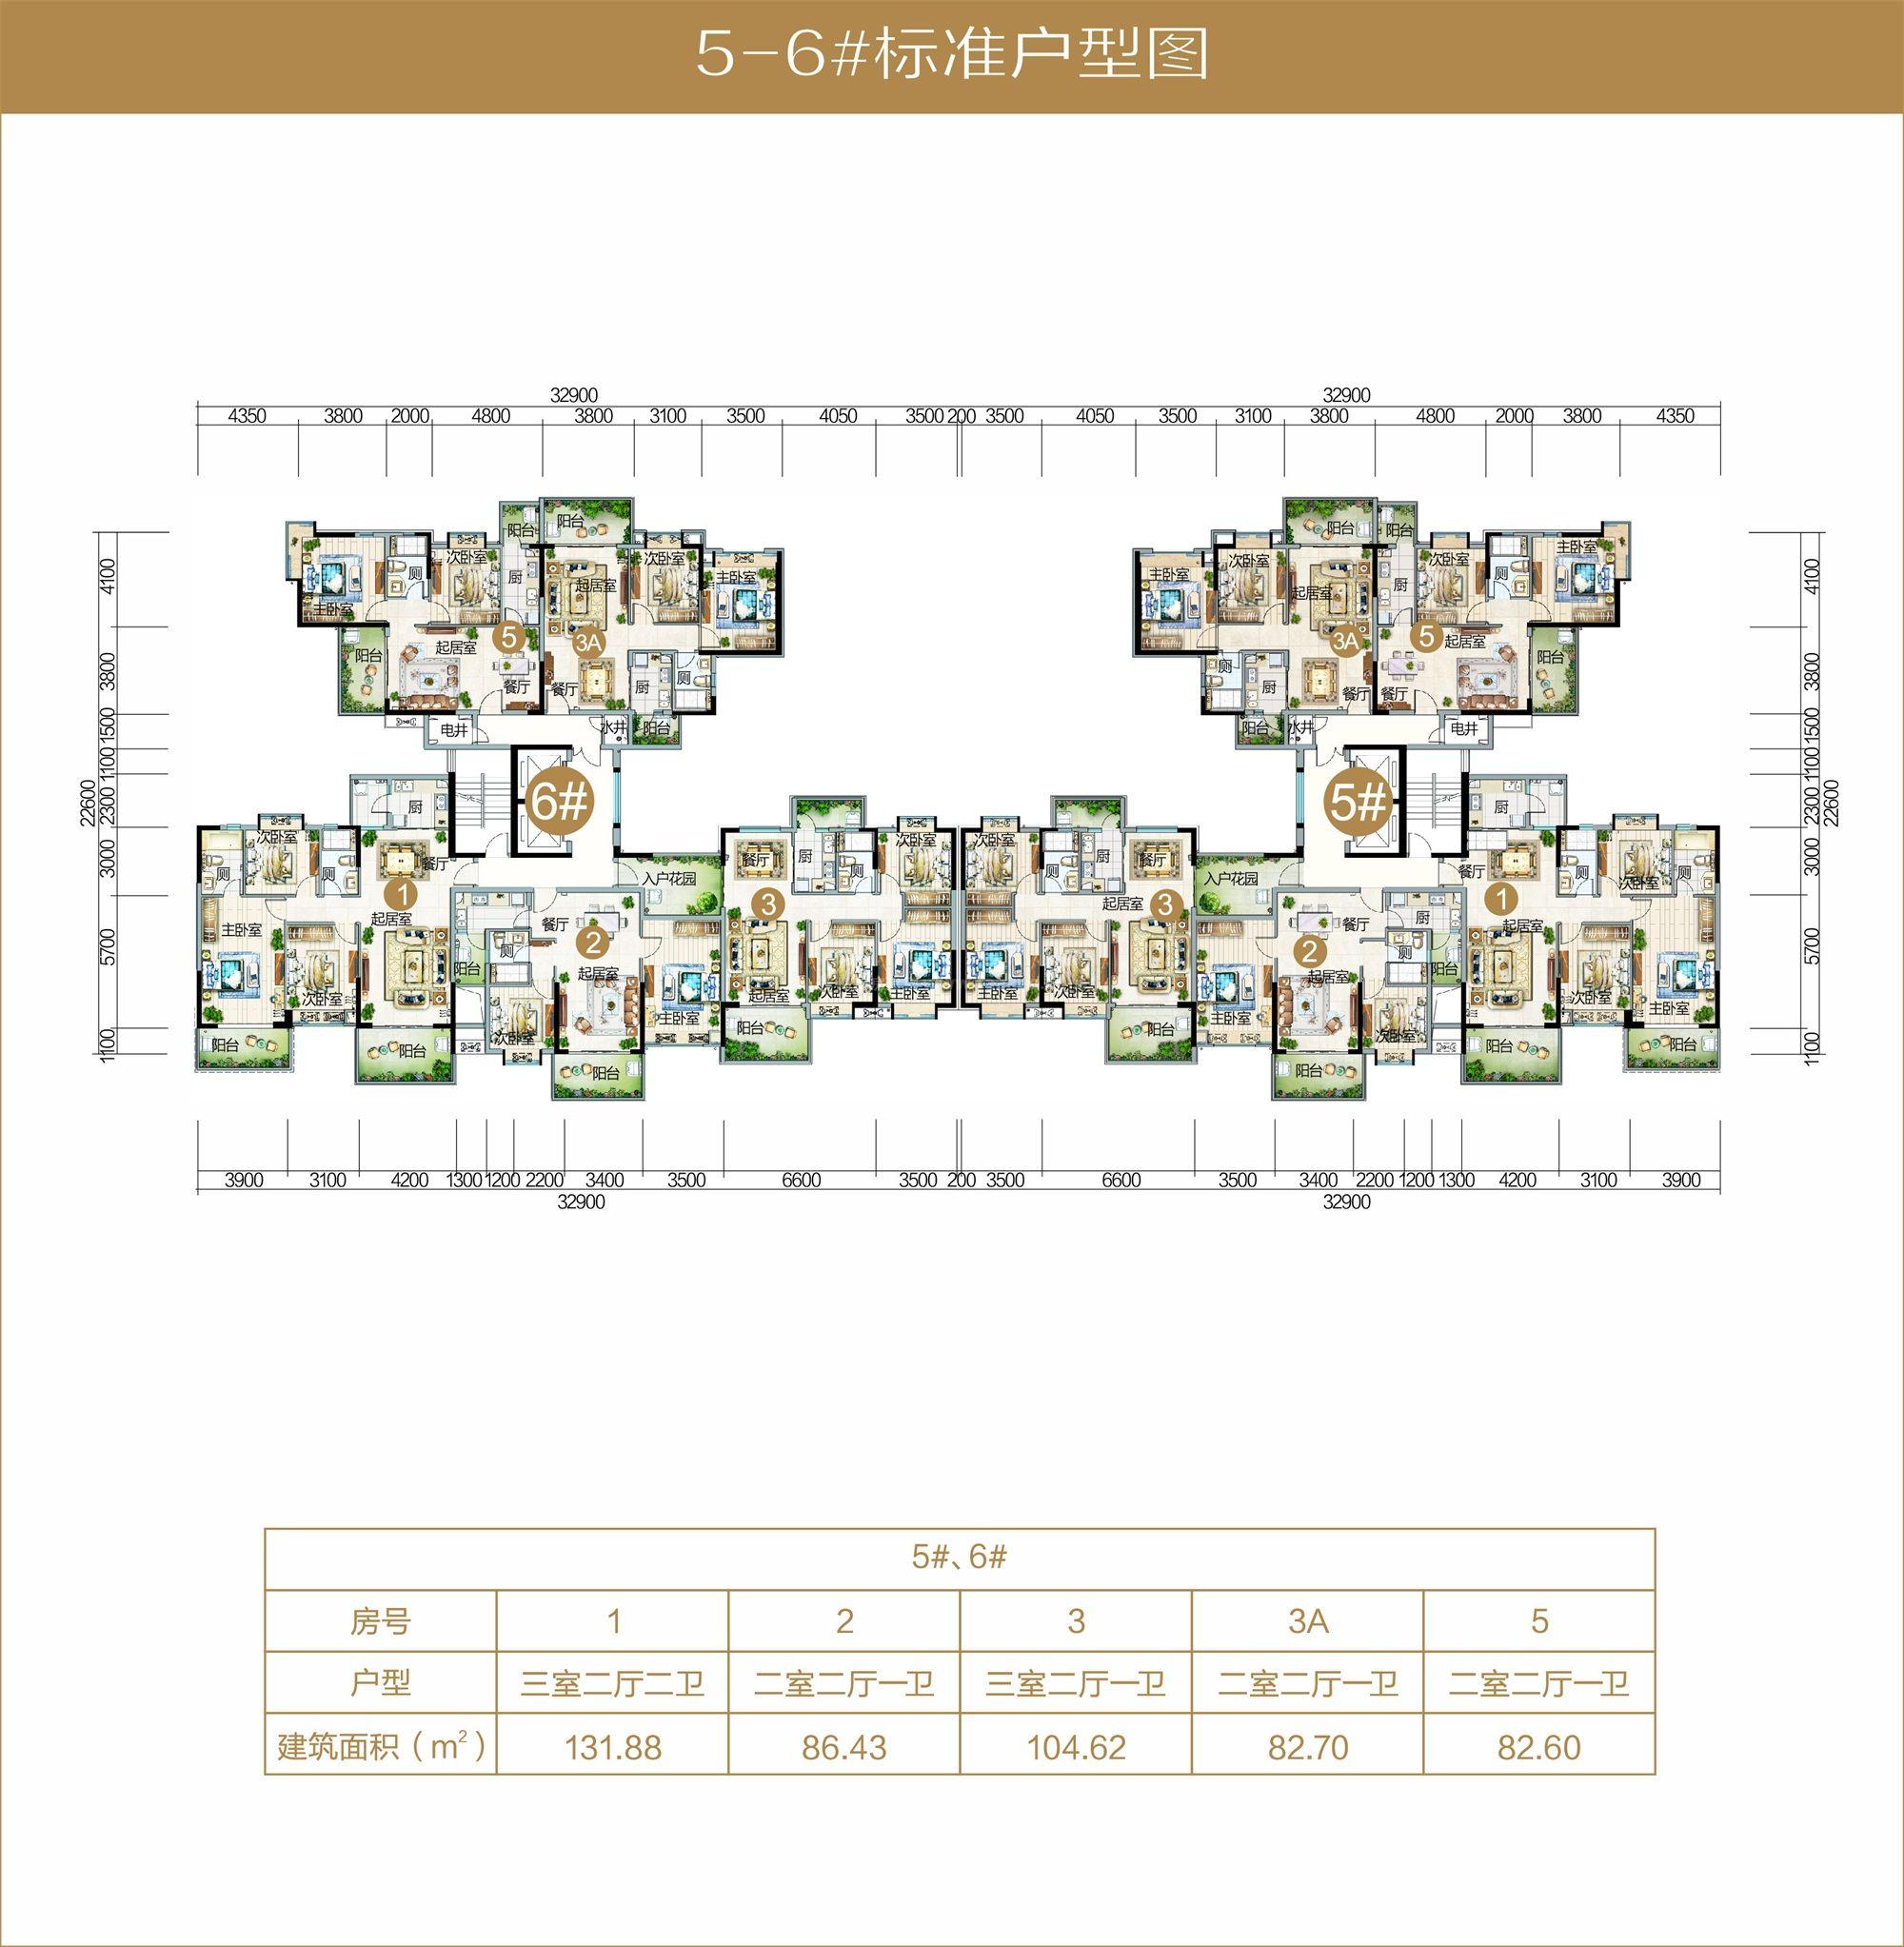 A05区5-6栋标准户型图